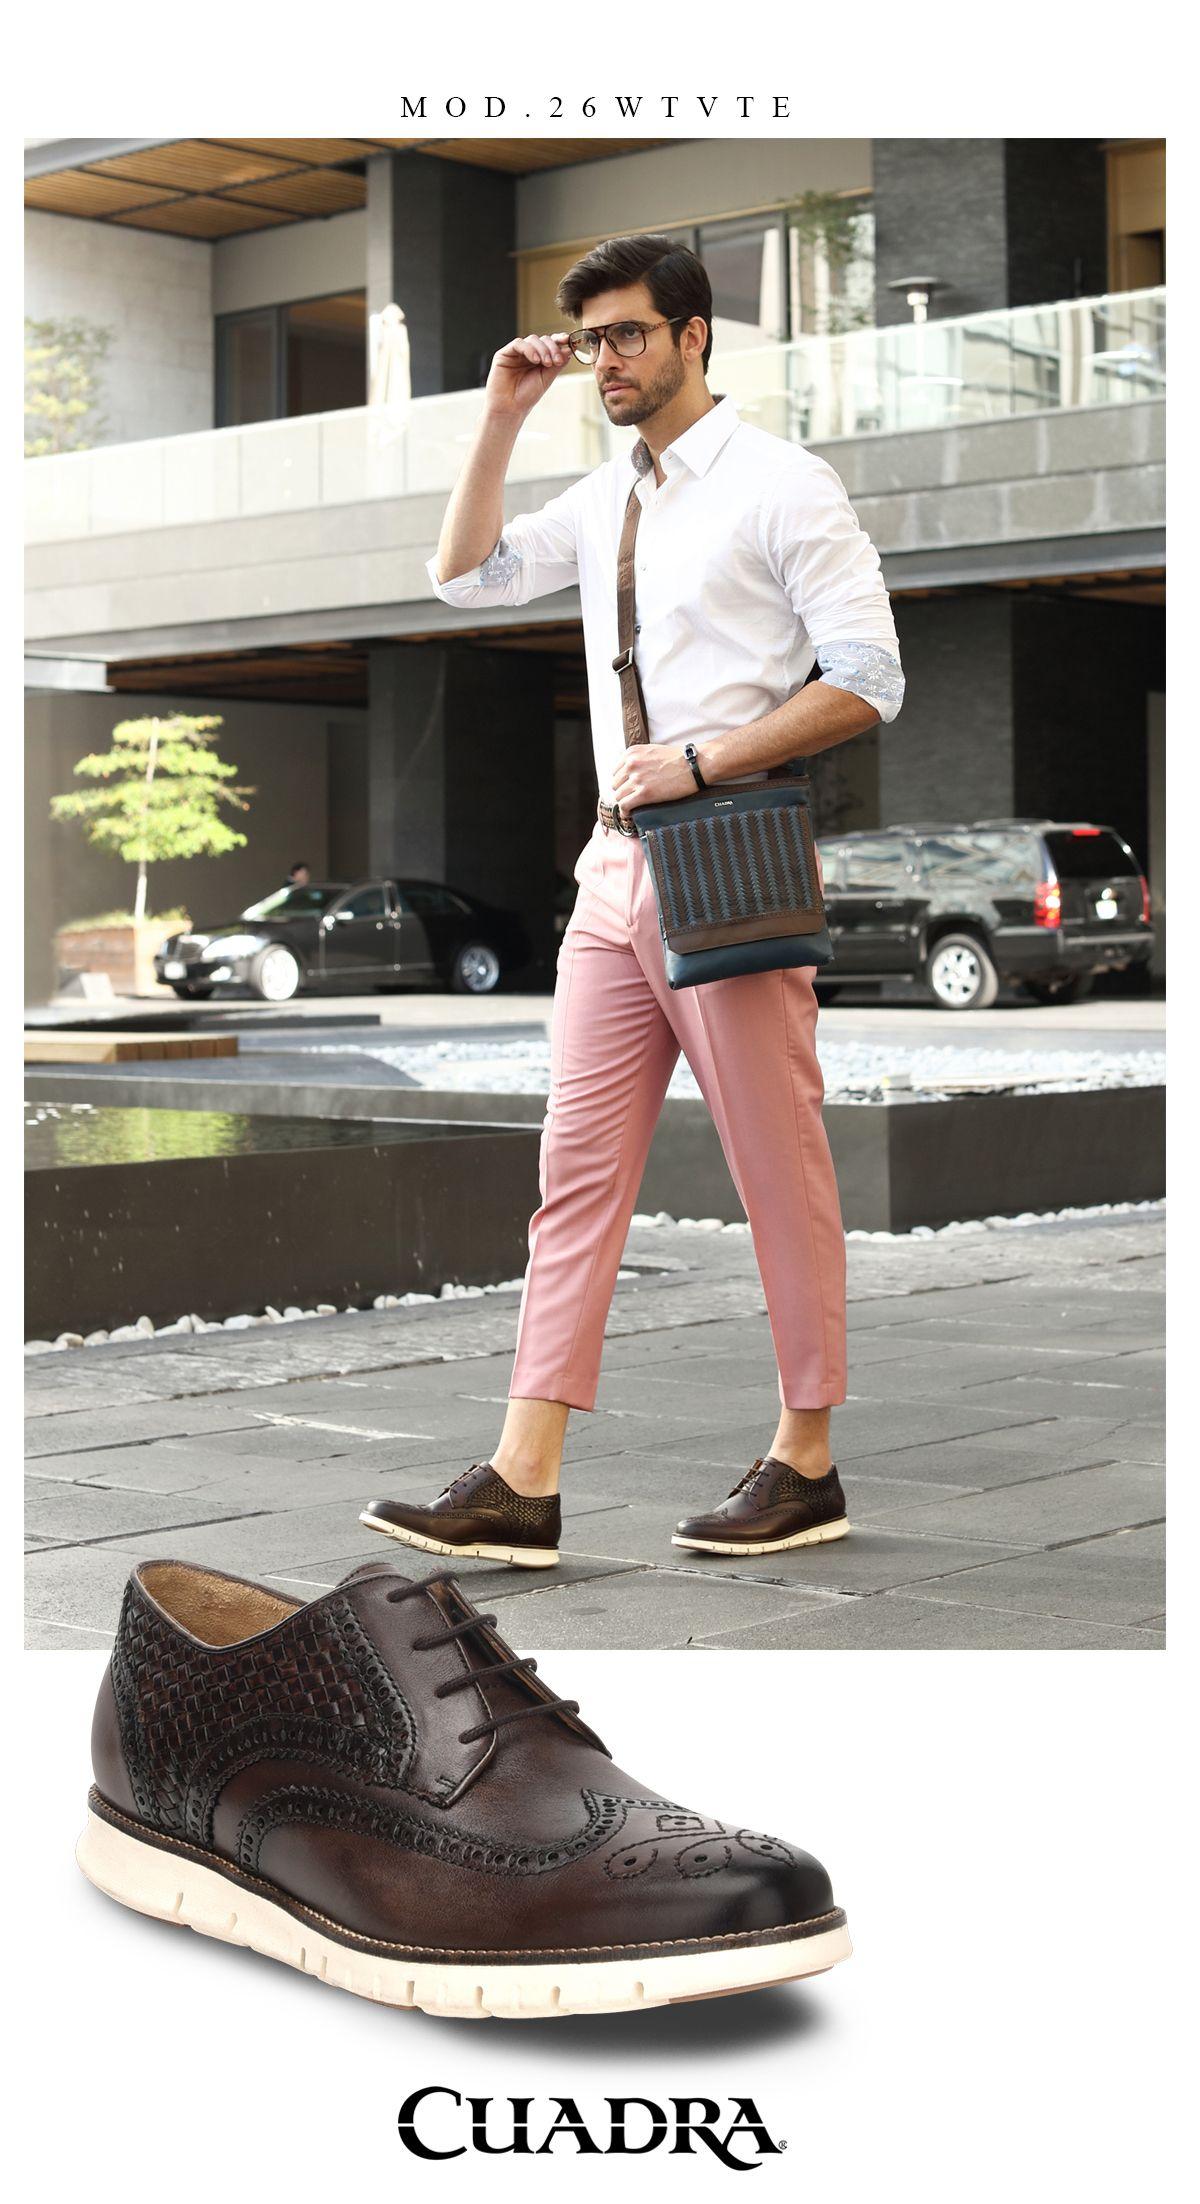 3da7640bea  shoes  hombre  zapatos  cuadra  piel  exótico  menstyle  lifestyle